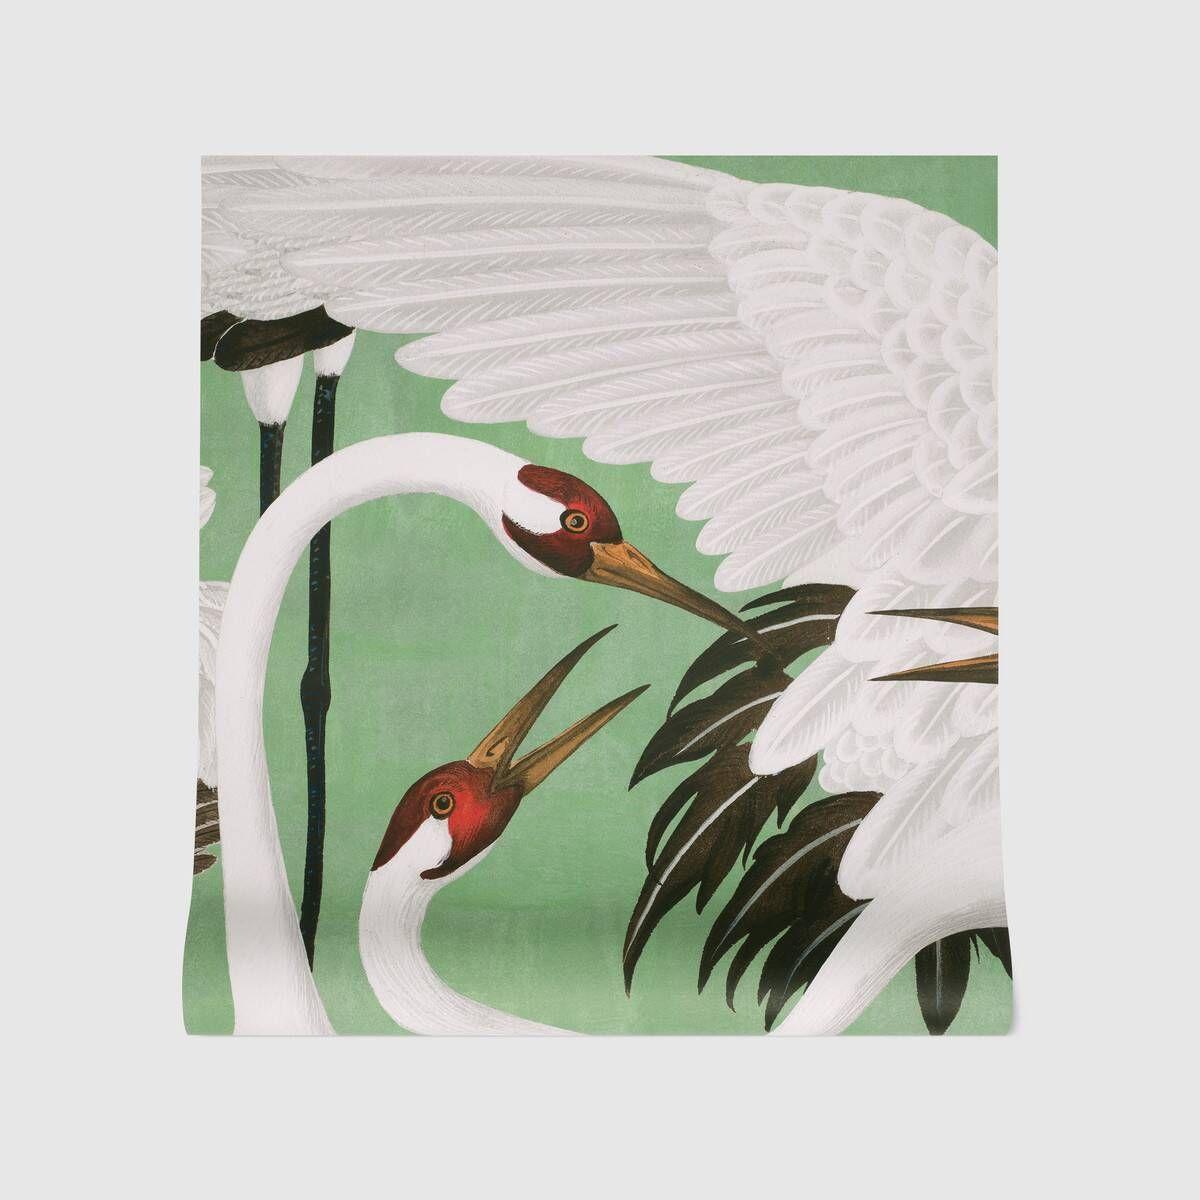 Gucci Heron print wallpaper Print wallpaper, Wallpaper